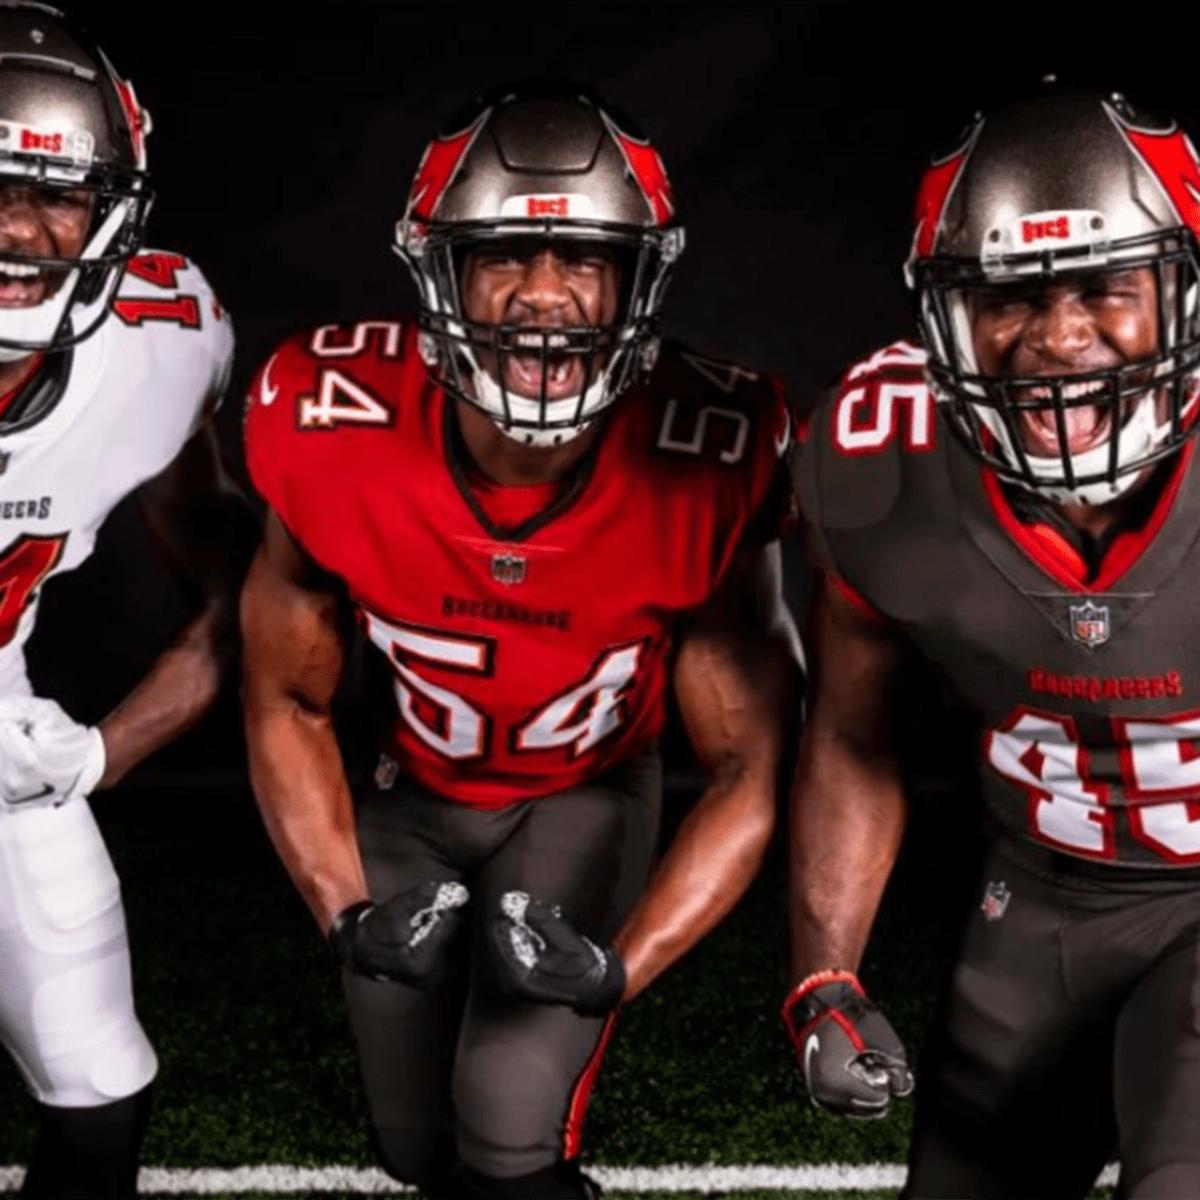 New Bucs Uniforms Unveiled Ahead Of 2020 Season Photos Sports Illustrated